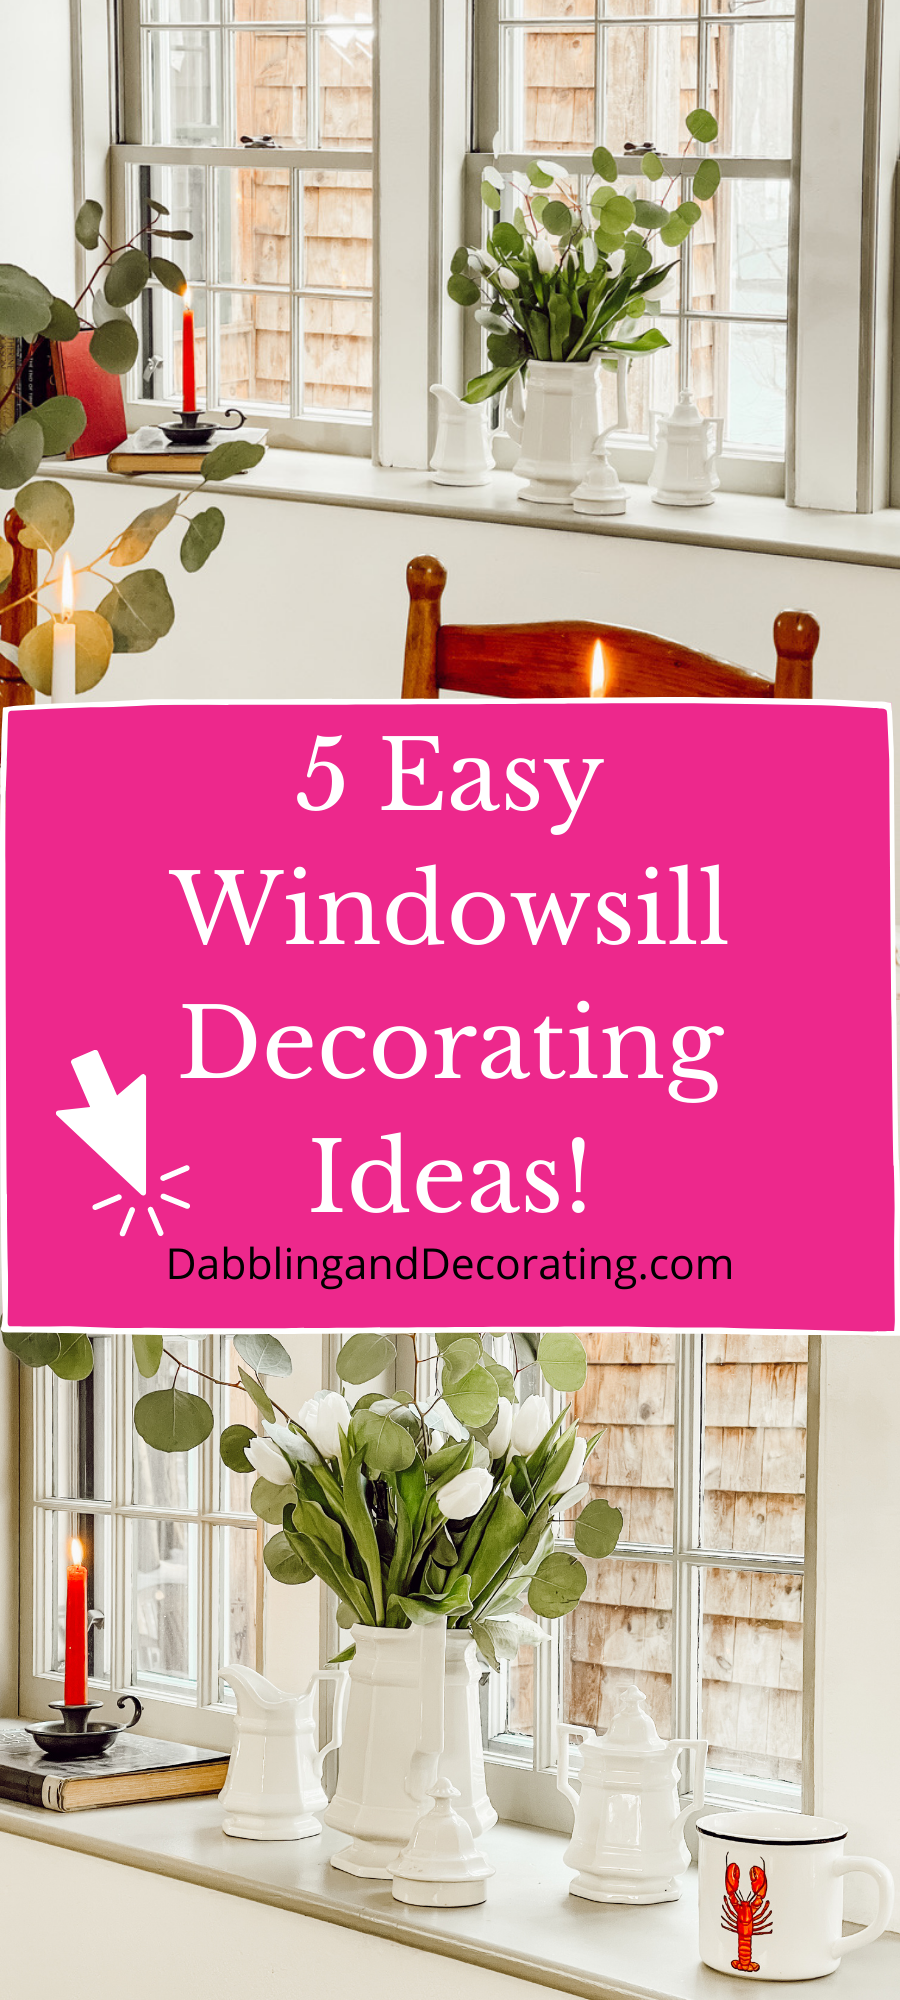 15 Easy Windowsill Decorating Ideas